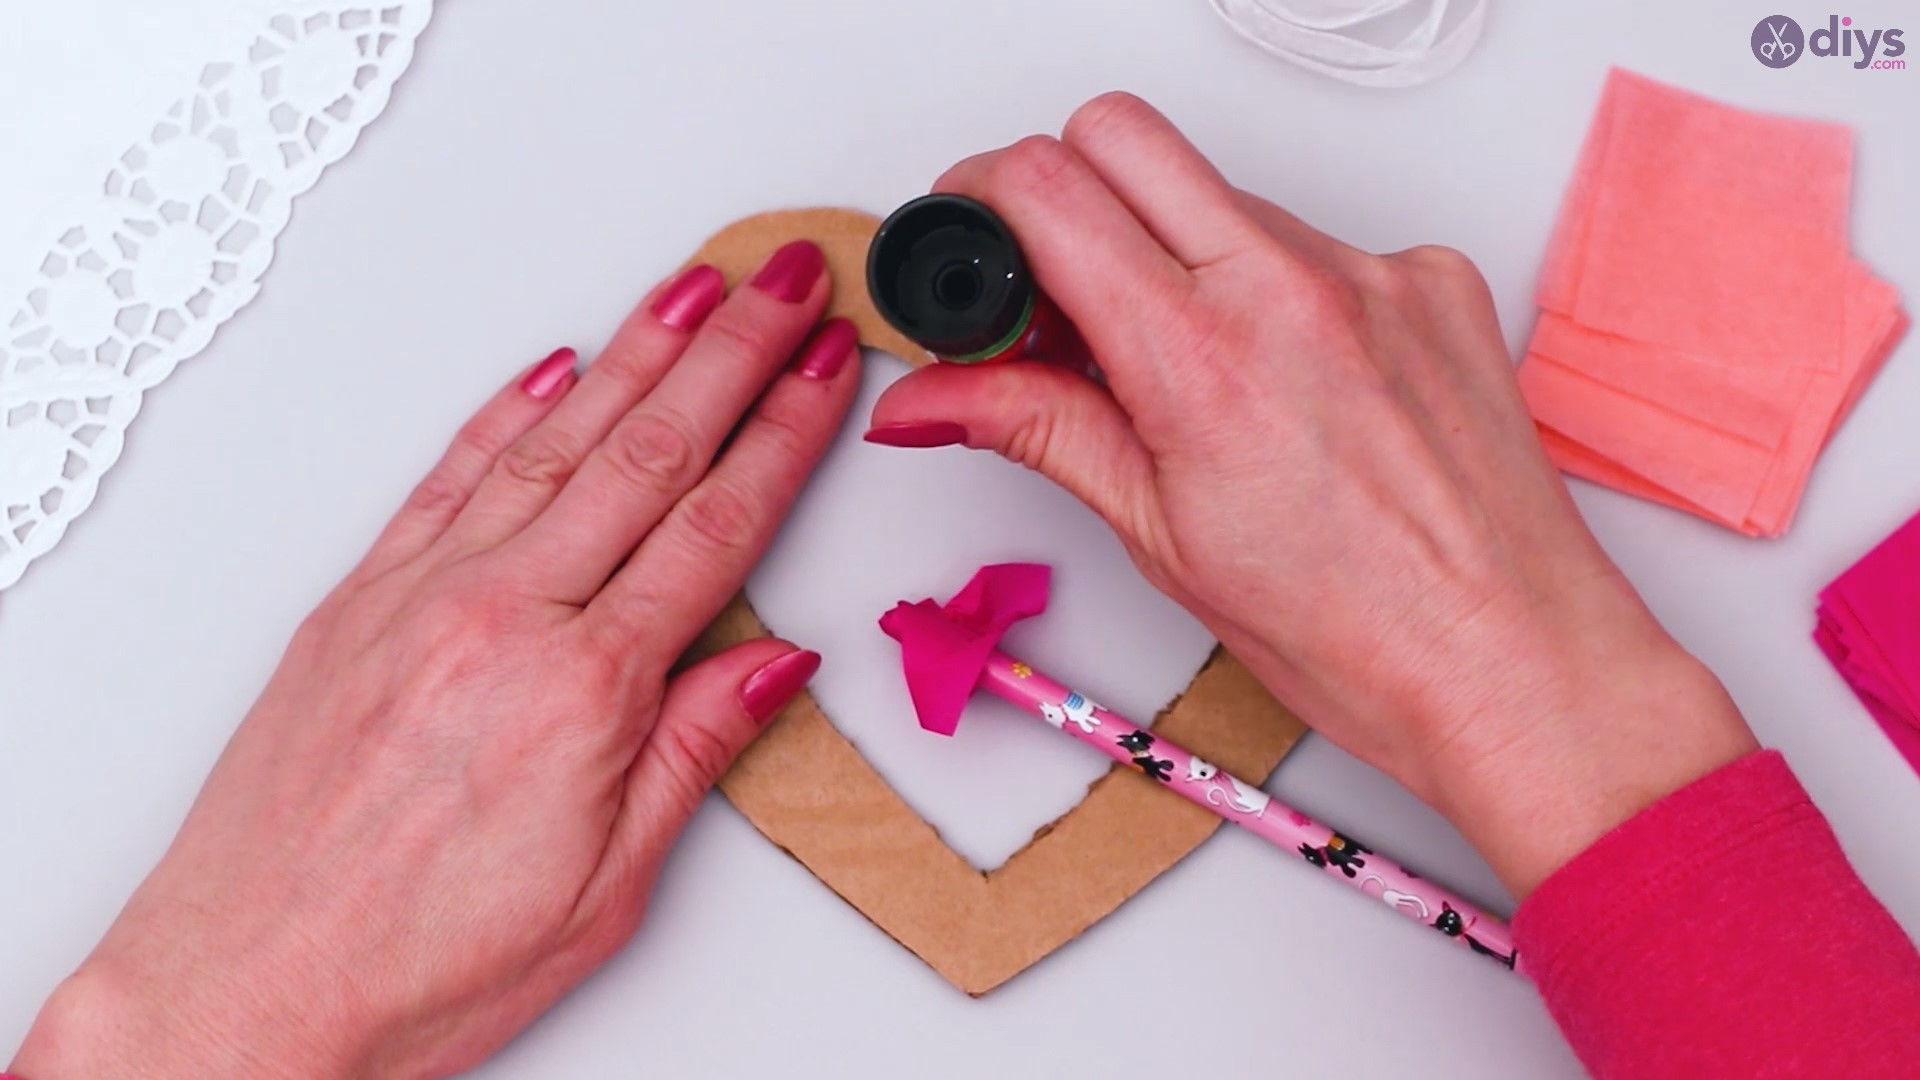 Diy tissue paper puffy heart step 1 (16)